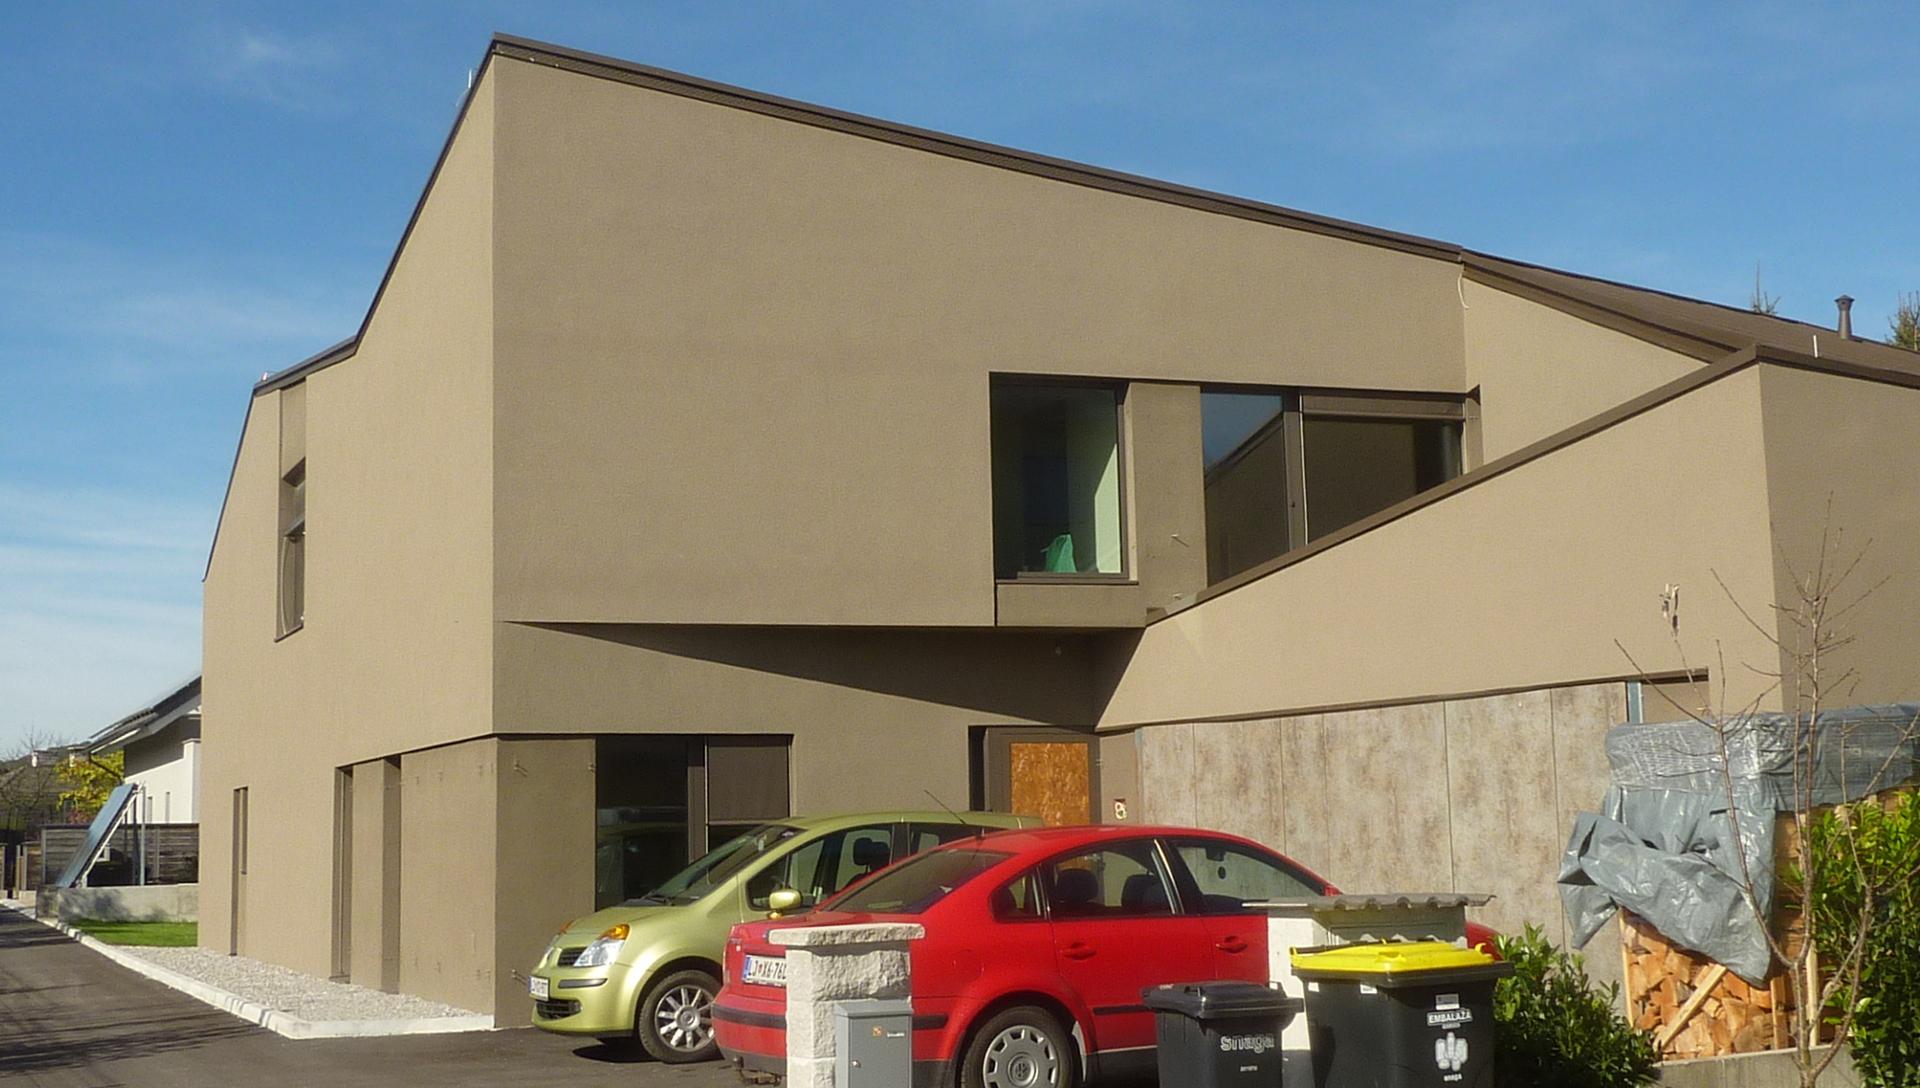 izgradnja-obnova objektov zaupanje medium